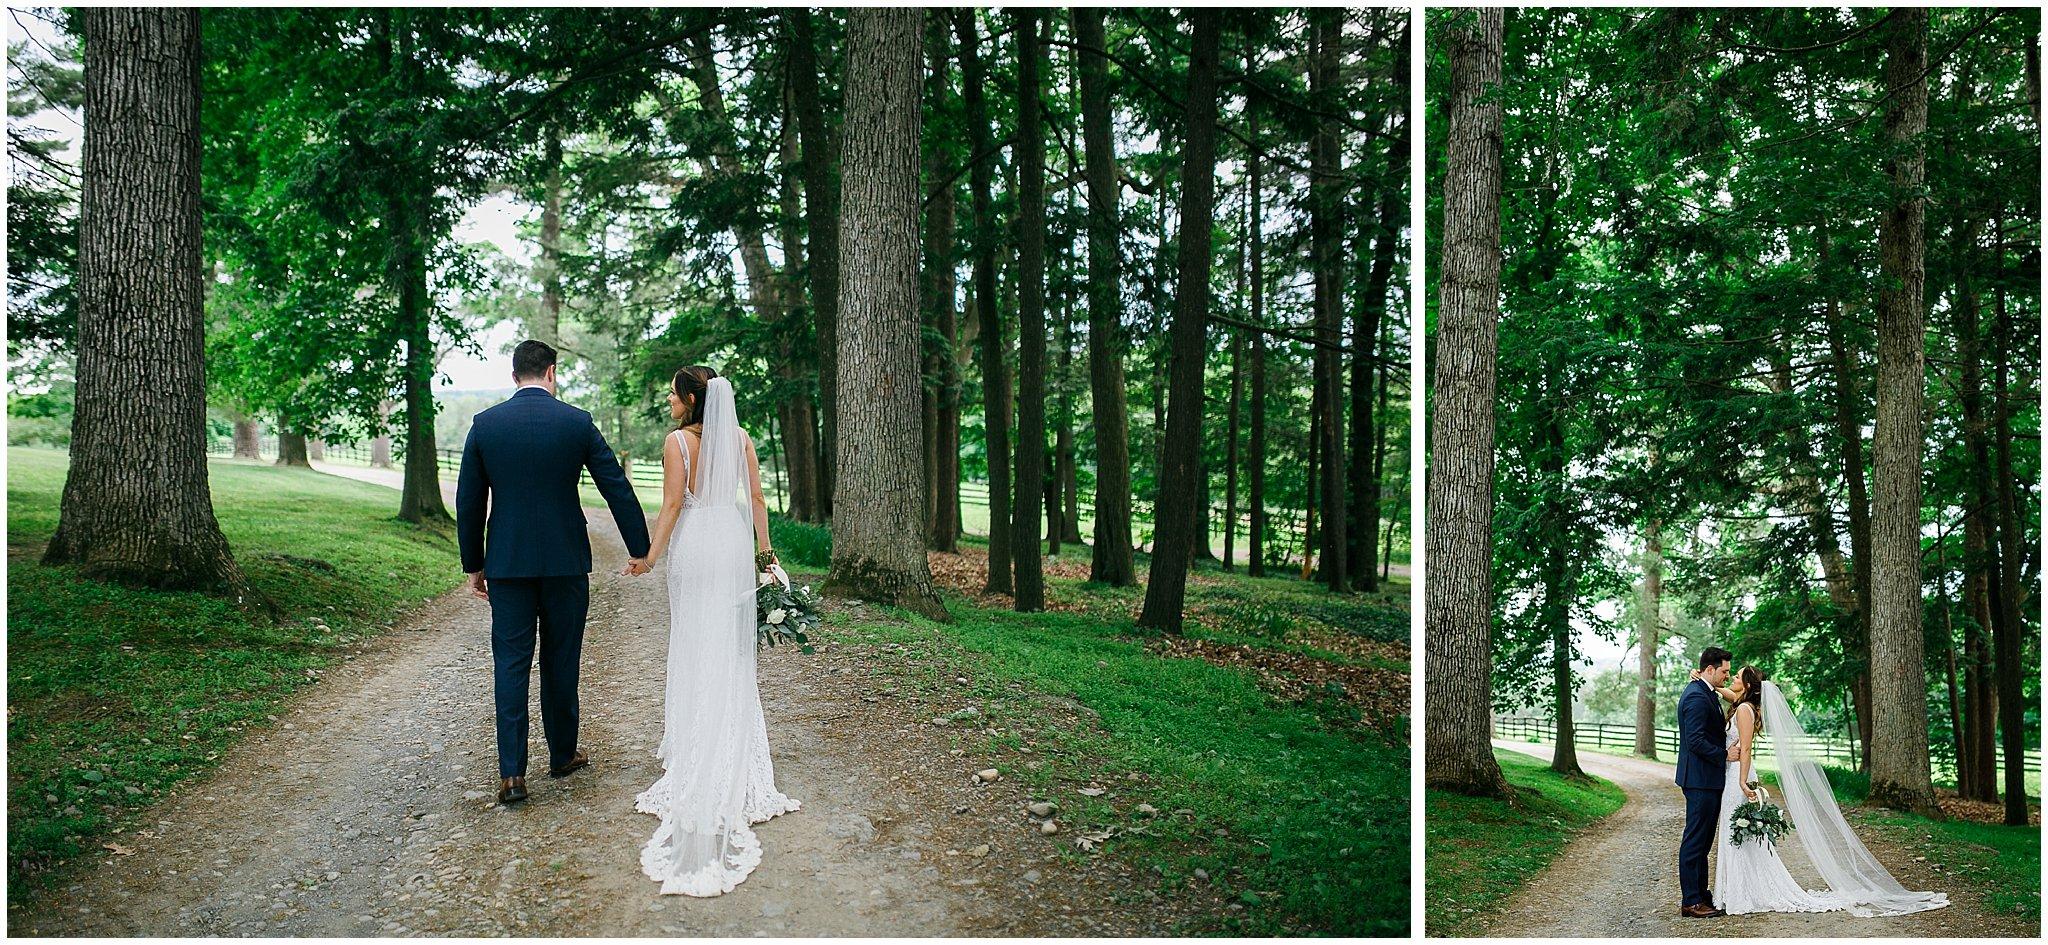 Hudson Valley Weddings at the Hill Hudson New York Wedding Photographer70.jpg